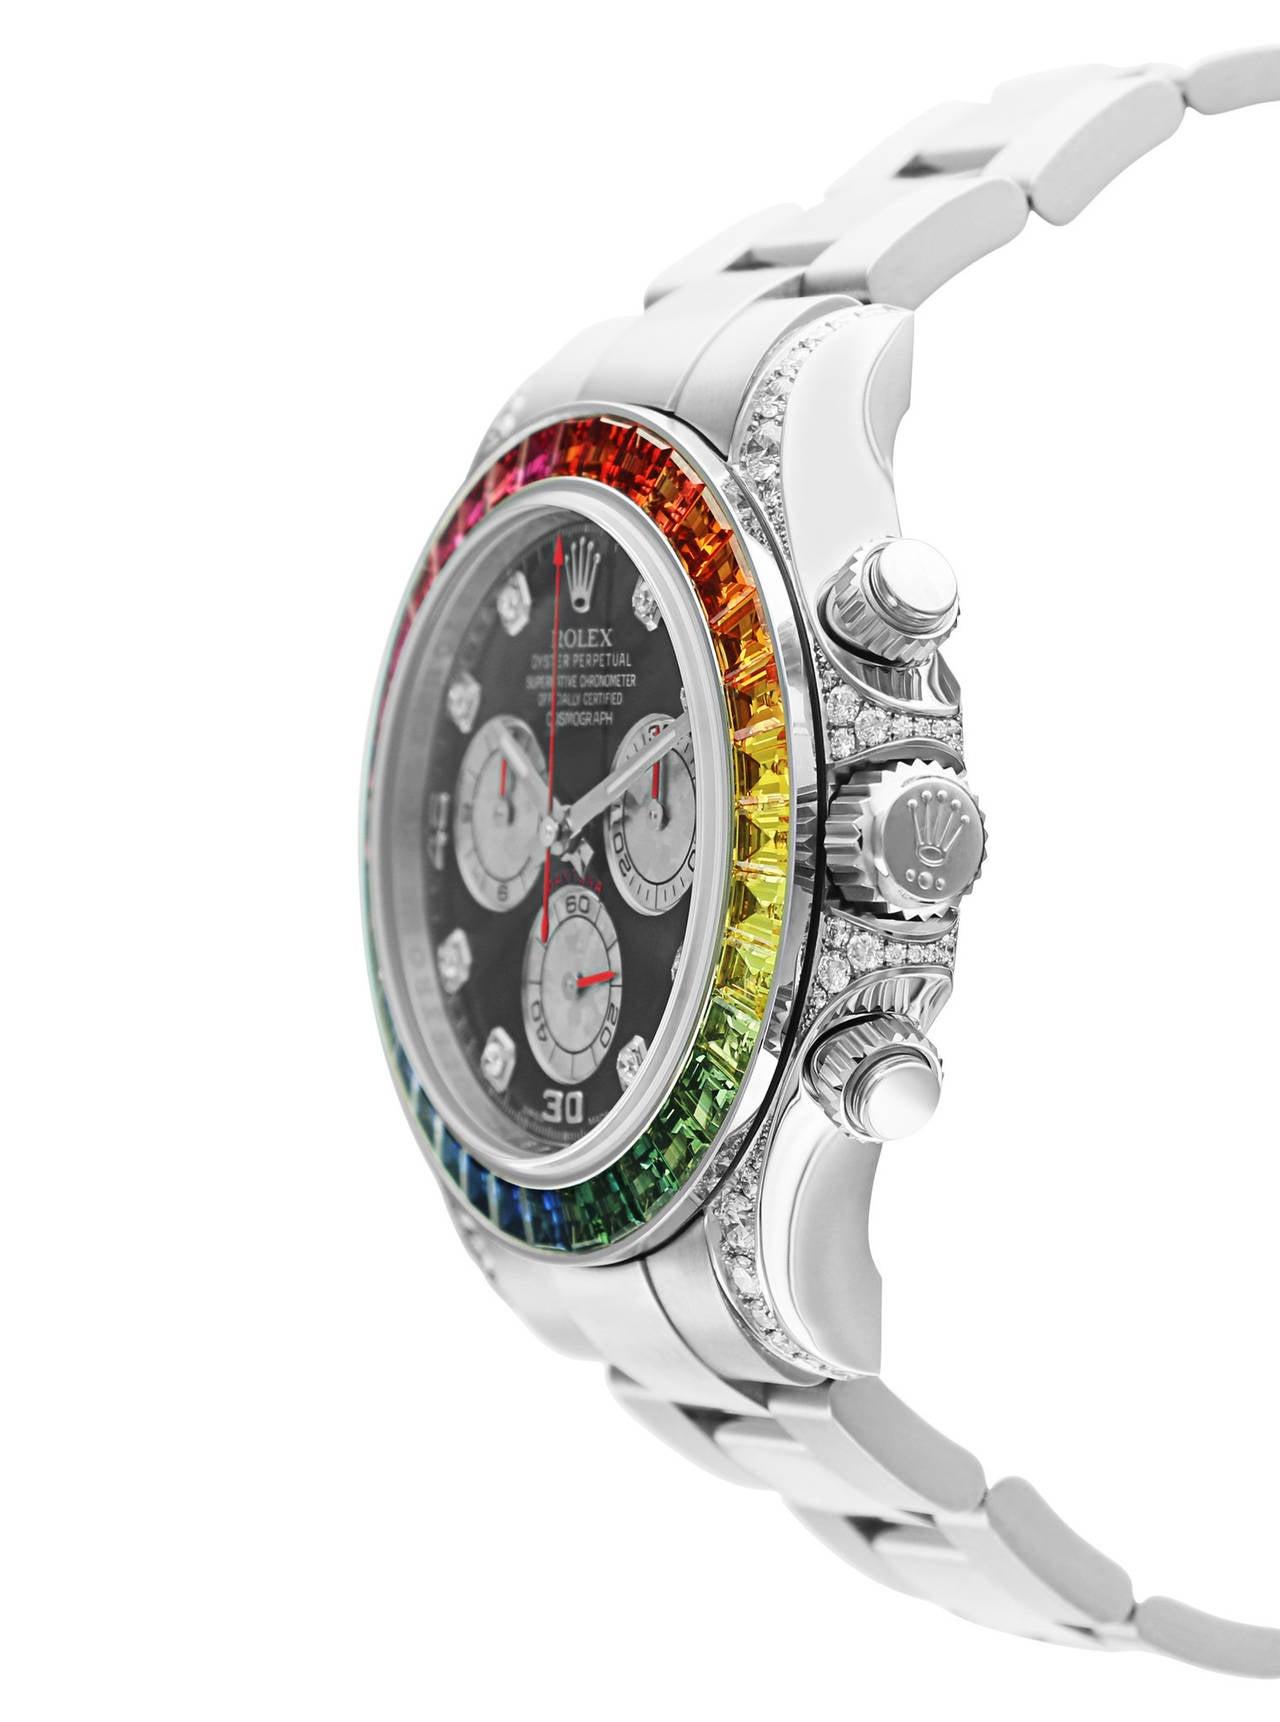 Rolex White Gold Daytona Rainbow Chronometer Wristwatch Ref 116599 3